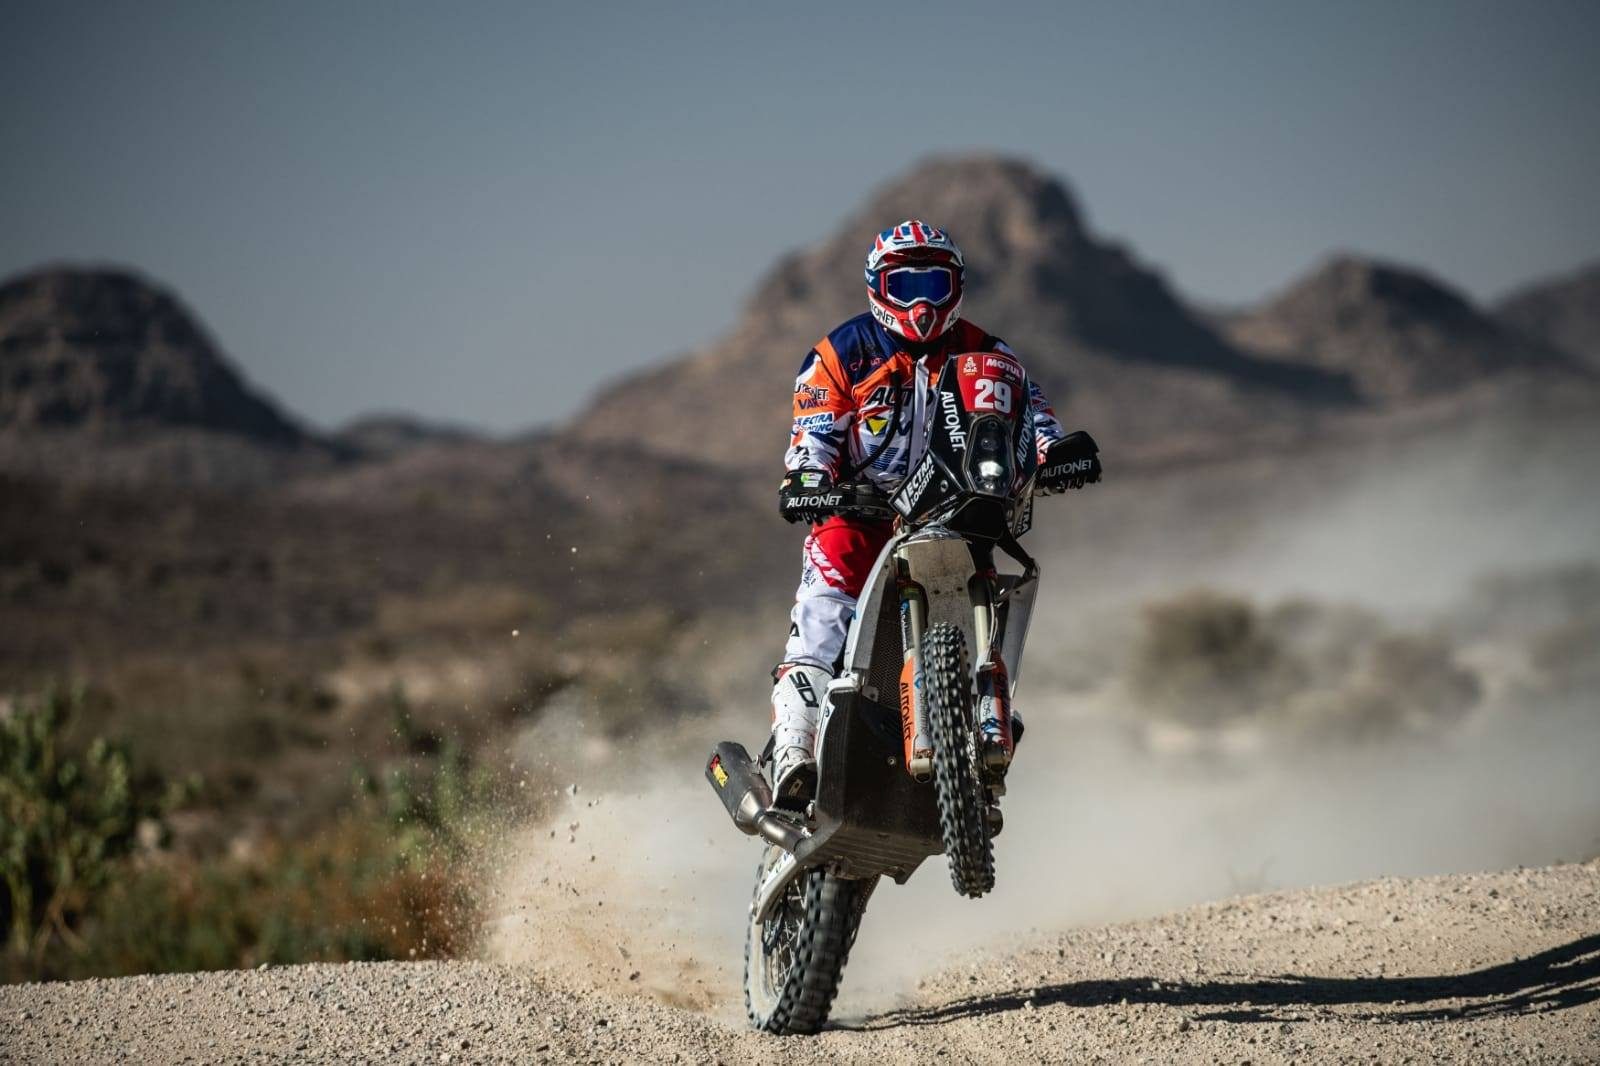 Emanuel Gyenes, lider după două etape la clasa Malle Moto, la Raliul Dakar